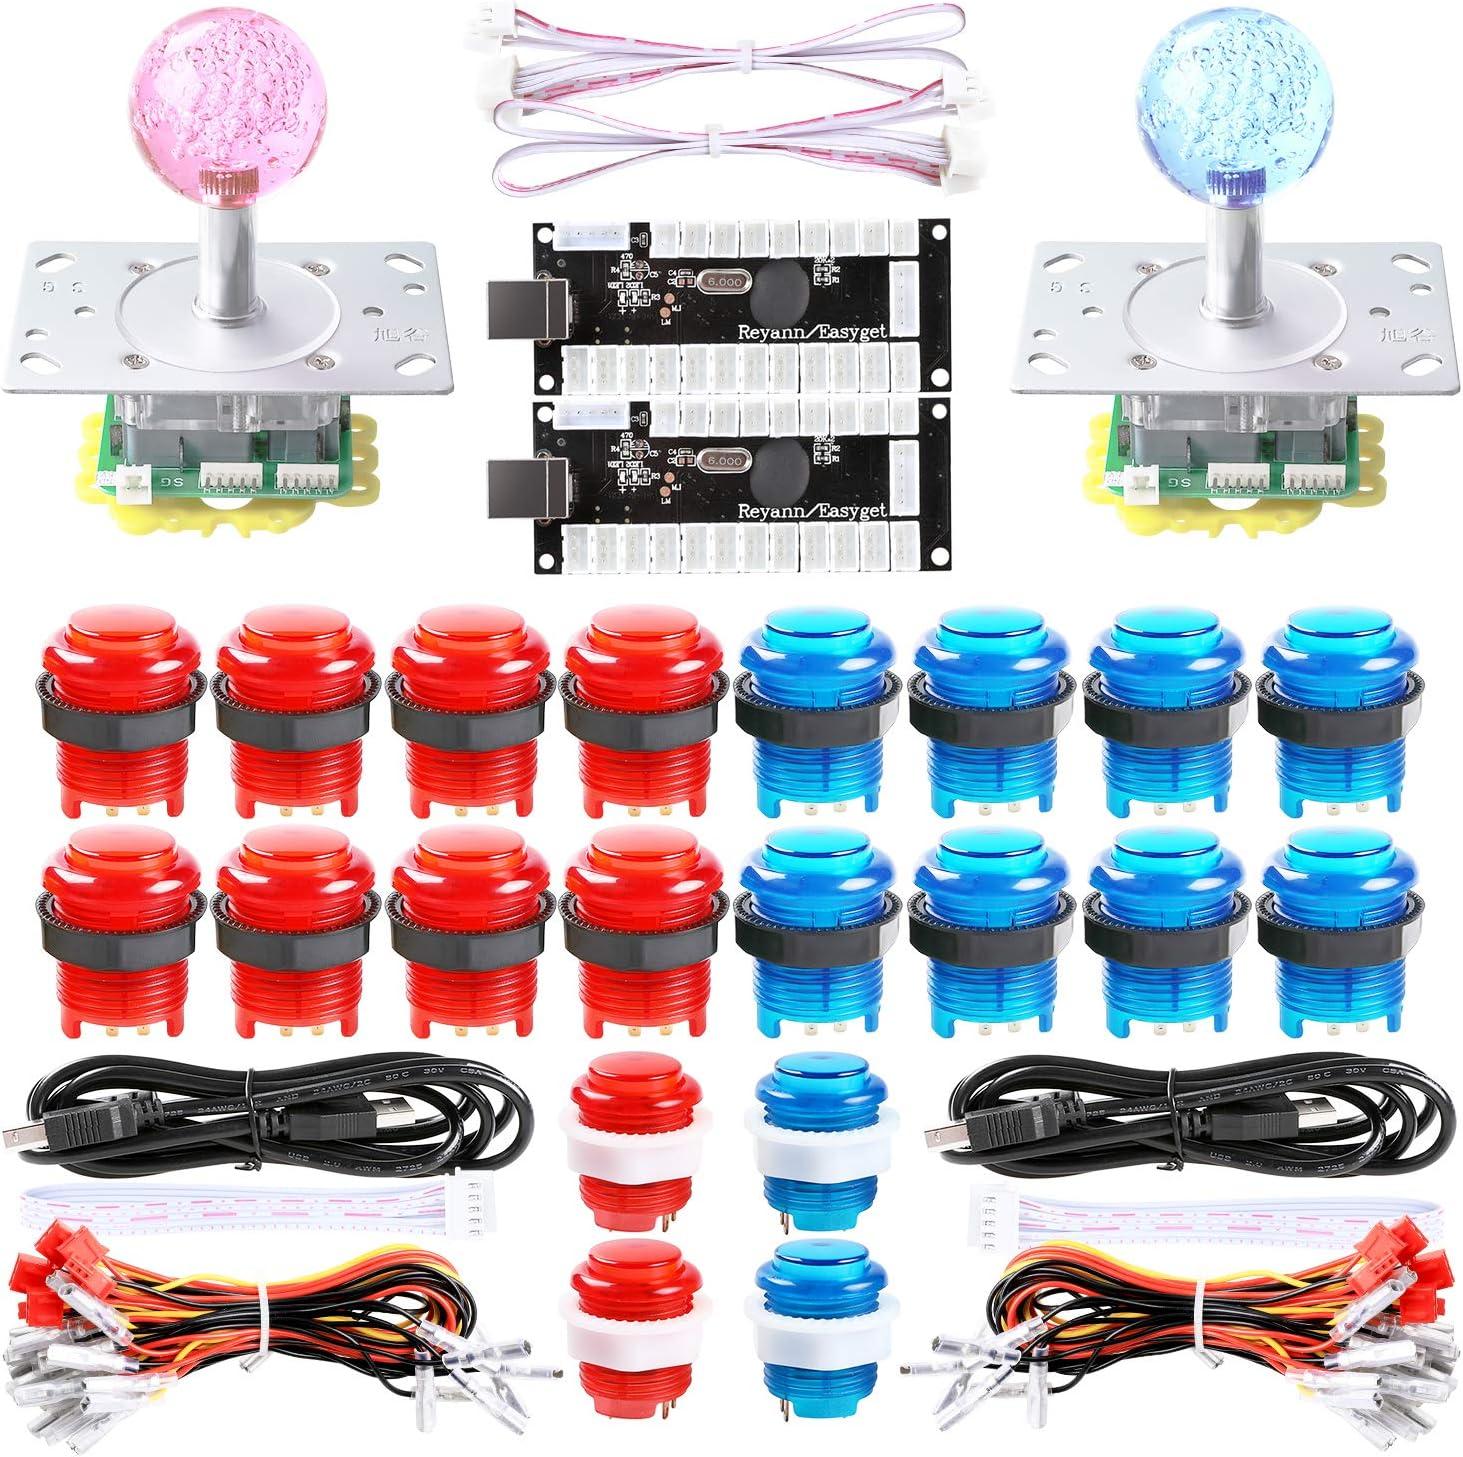 Blue Kits Dashtop LED Arcade DIY Parts 2X Zero Delay USB Encoder 2X 2//4//8 Way LED Joystick 20x LED Illuminated Push Buttons for Mame Windows System /& Raspberry Pi Projece Arcade Project Red